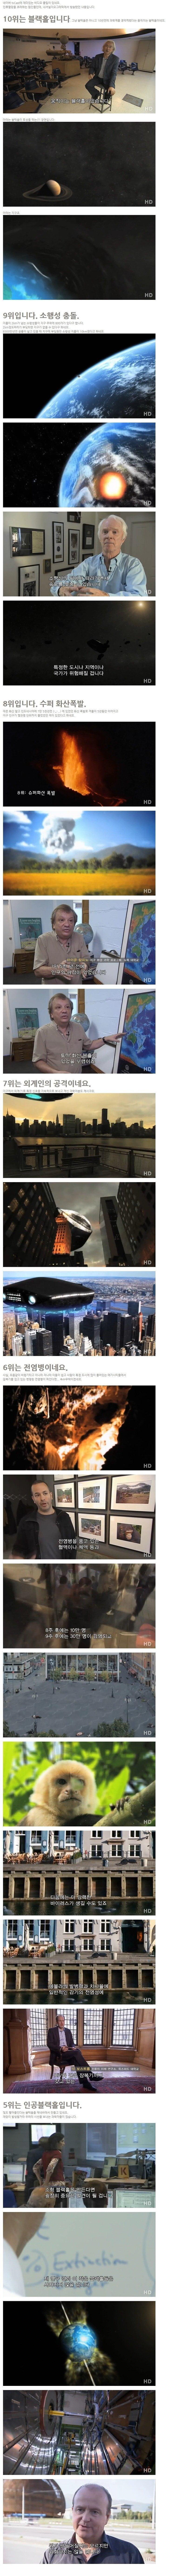 viewimage.php?id=3eb4de21e9d73ab360b8dab04785736f&no=24b0d769e1d32ca73dec81fa11d028314d3faebecfec25ed6aa779bc795af309409e152f1366dd4a3cf0f51bfa2289cfd37e5e2561269d53621fc1898a1bd0bea4f5d0d09ca29e1b17a5bbdfa6cfda5f1e35a53898a638c1f7a7702342b9dd2c34d720119cfb2d5842486e3dd5